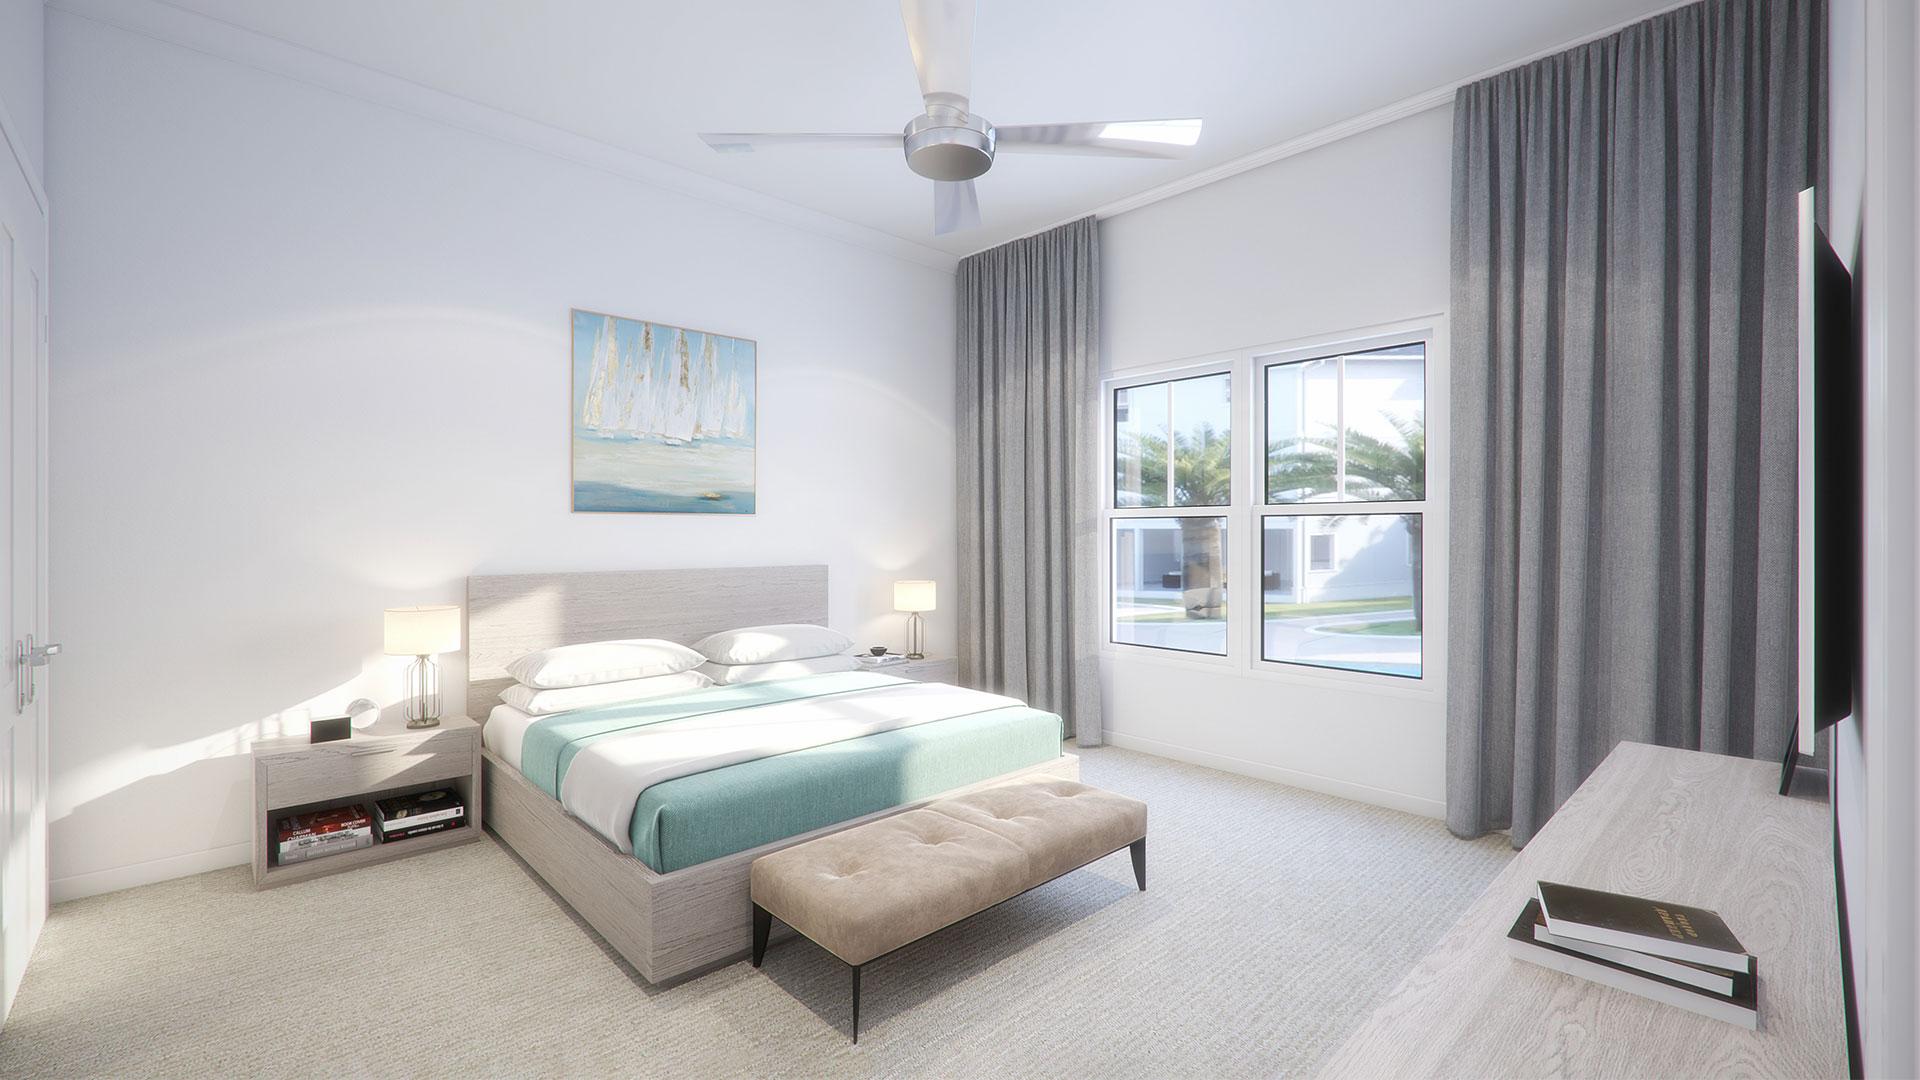 A Poolside1 master bedroom